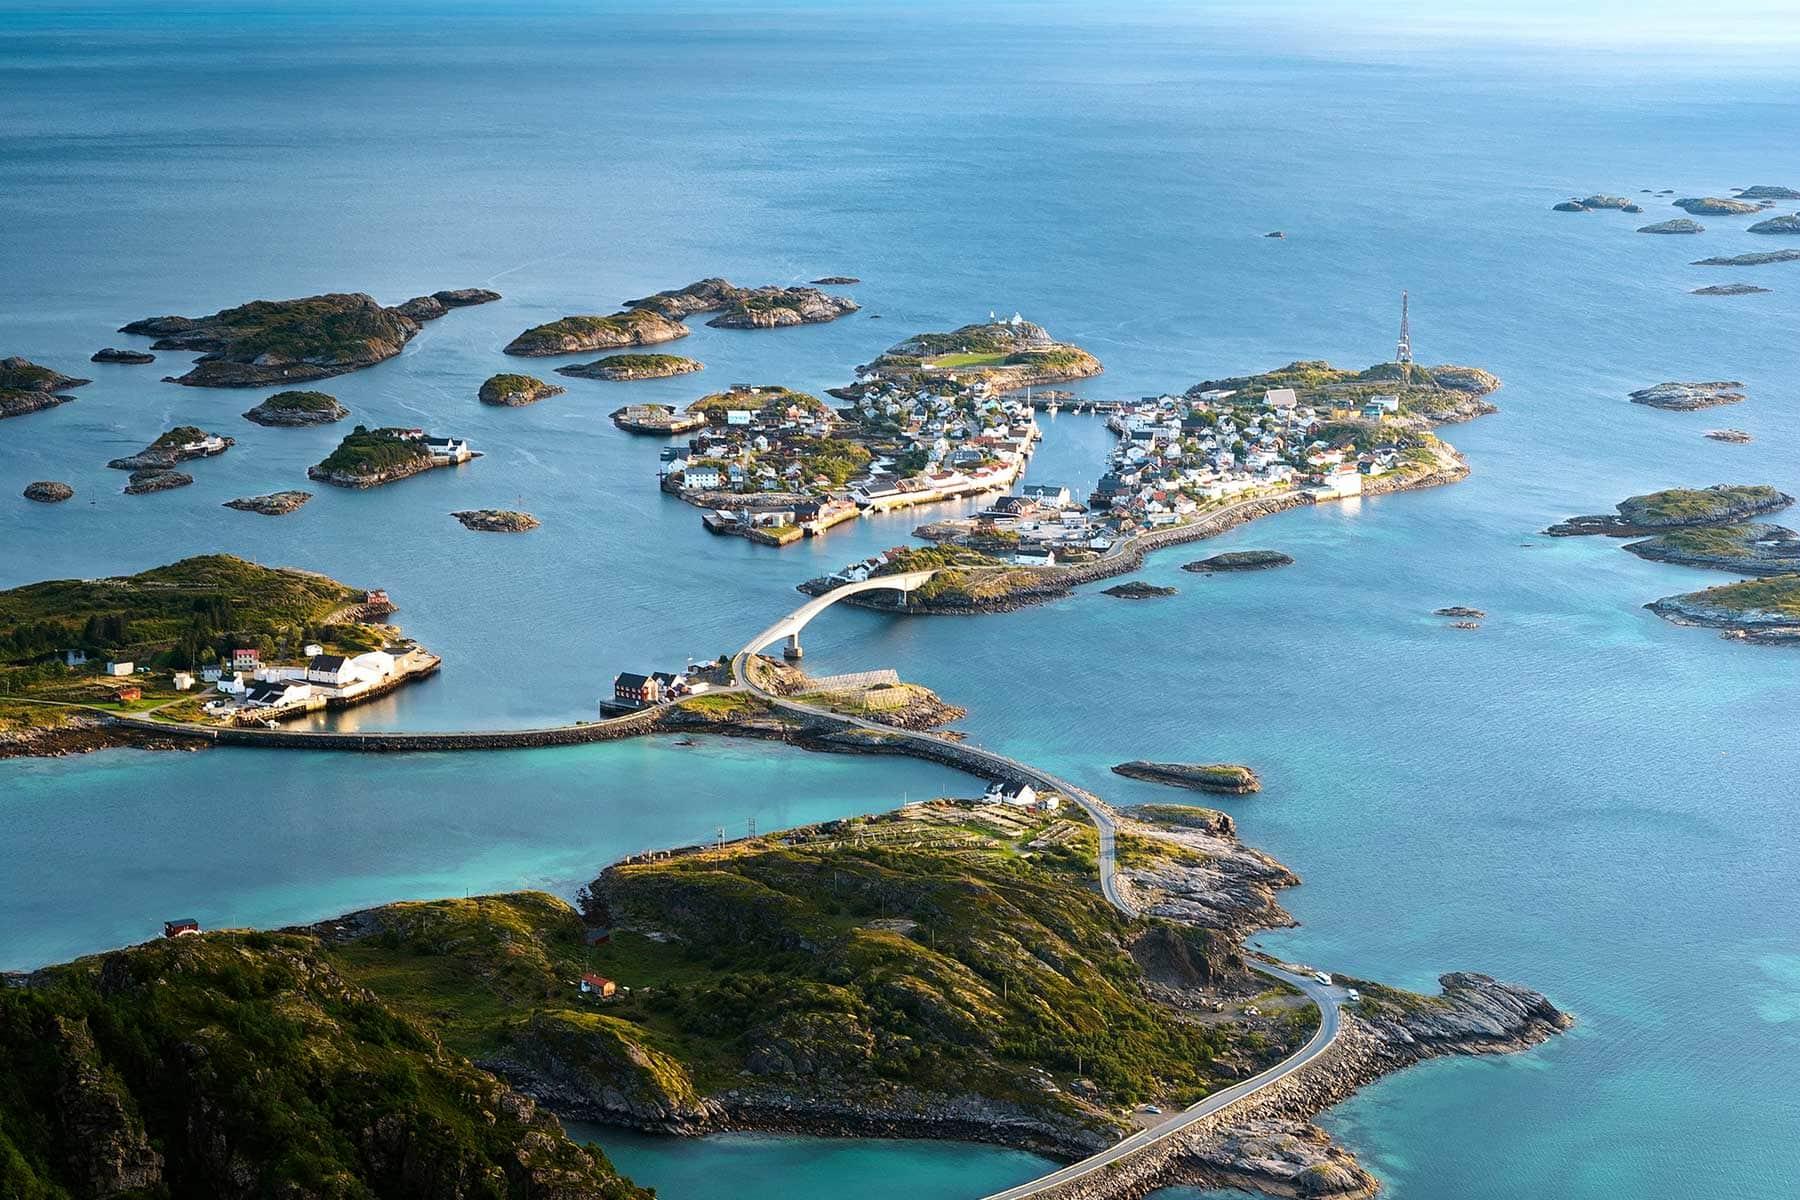 Resor-till-Lofoten-i-Norge---landskap-kusten-Nygren-Lind-Resebyrå